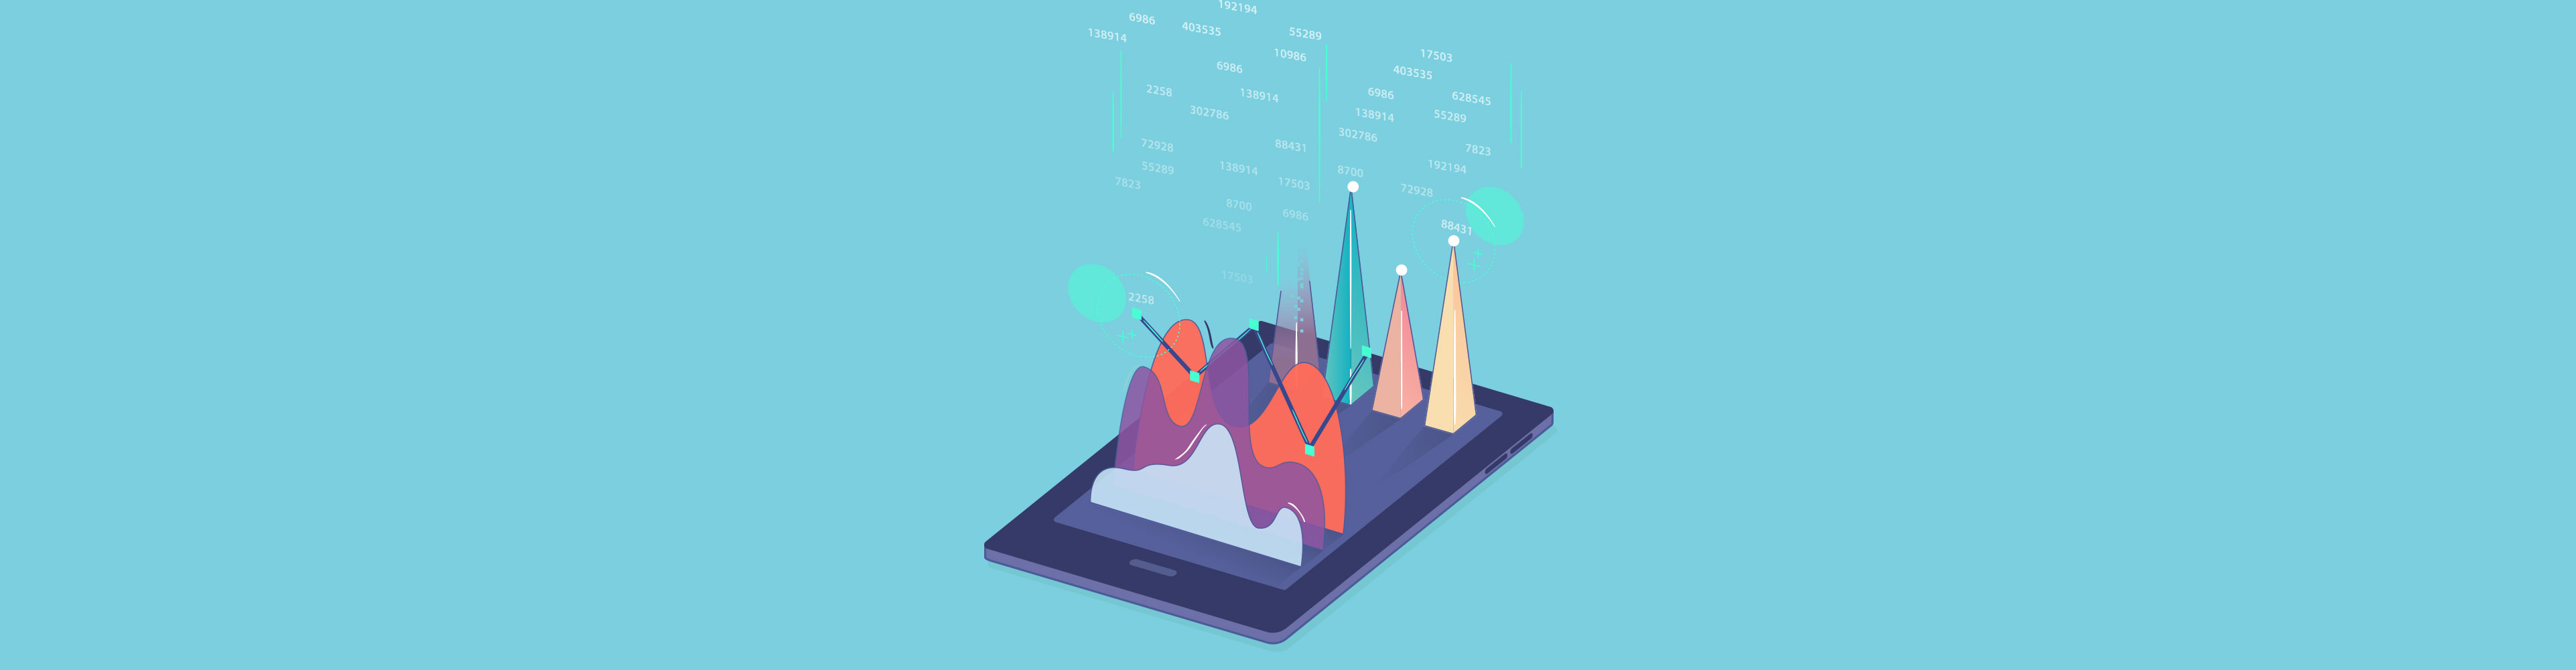 best data visualizations 2018 - header